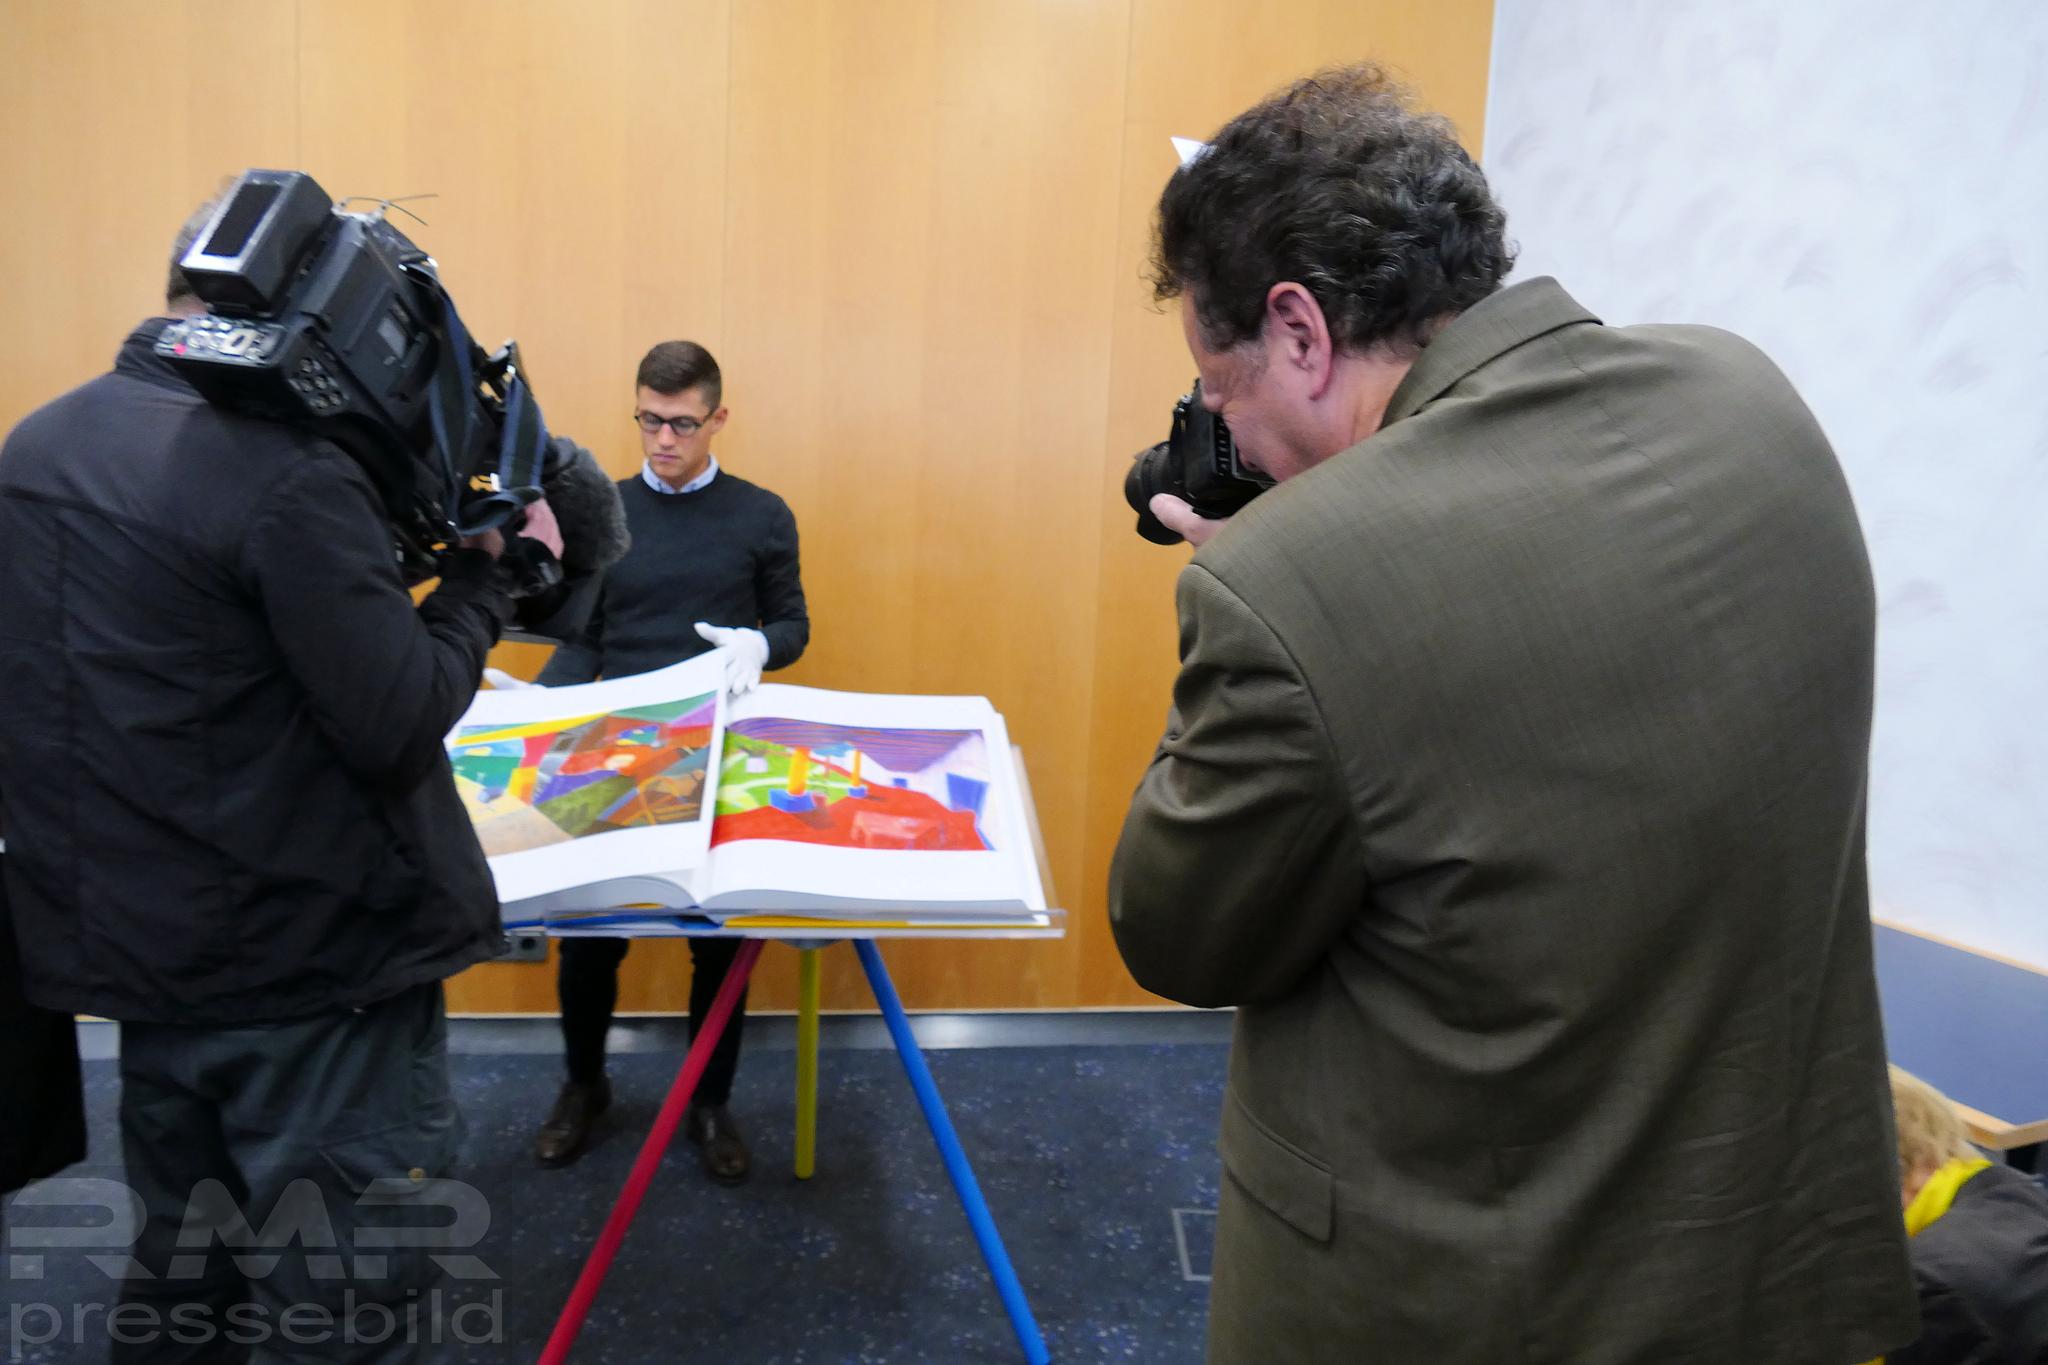 Medien © Klaus Leitzbach/frankfurtphoto